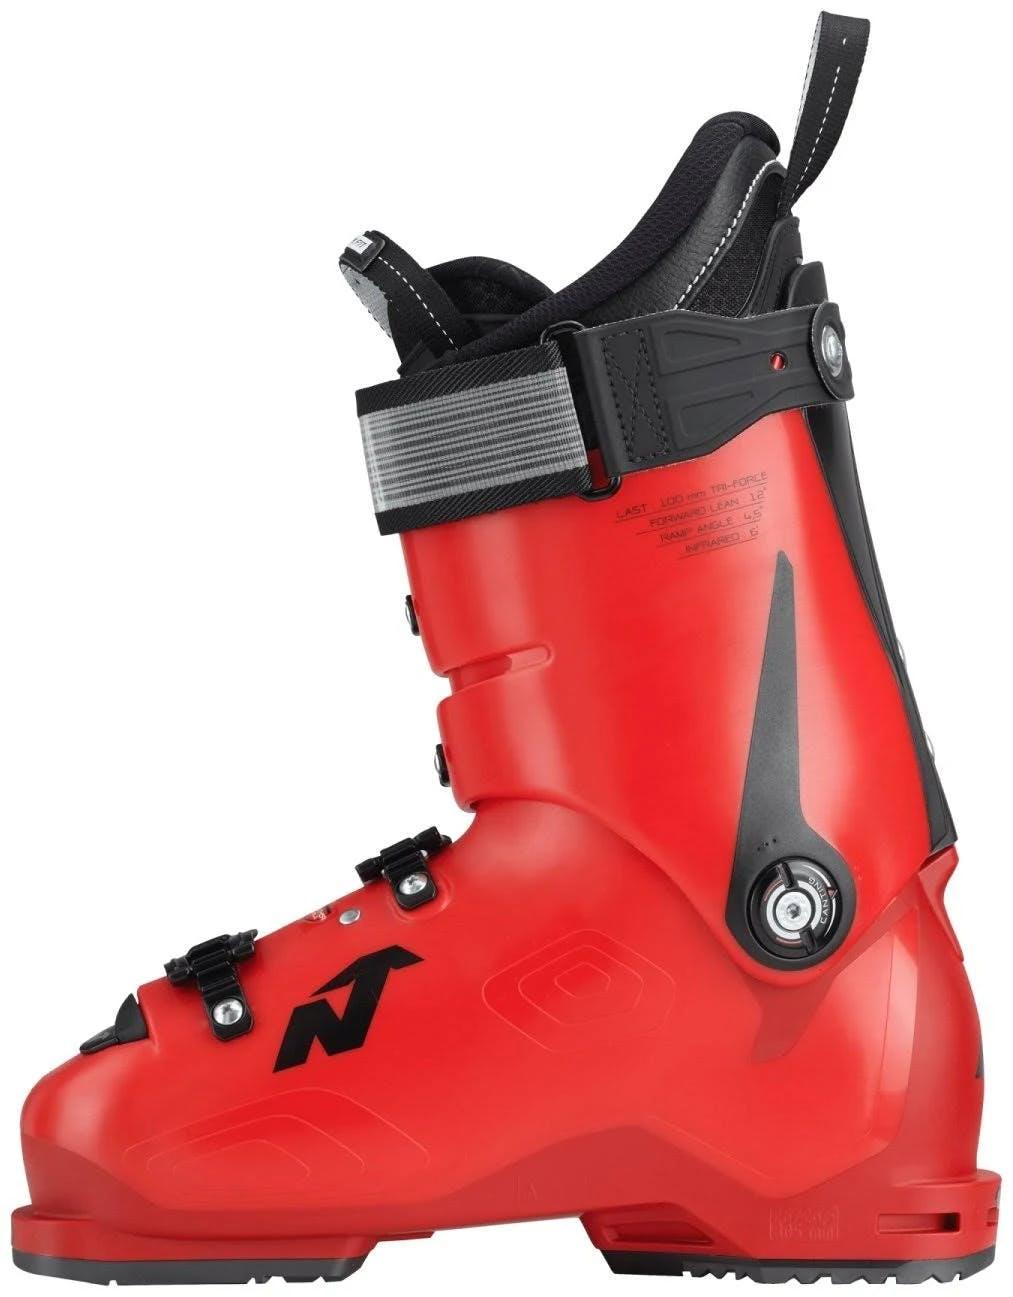 Nordica Speedmachine 120 Ski Boots Red-black 26.5